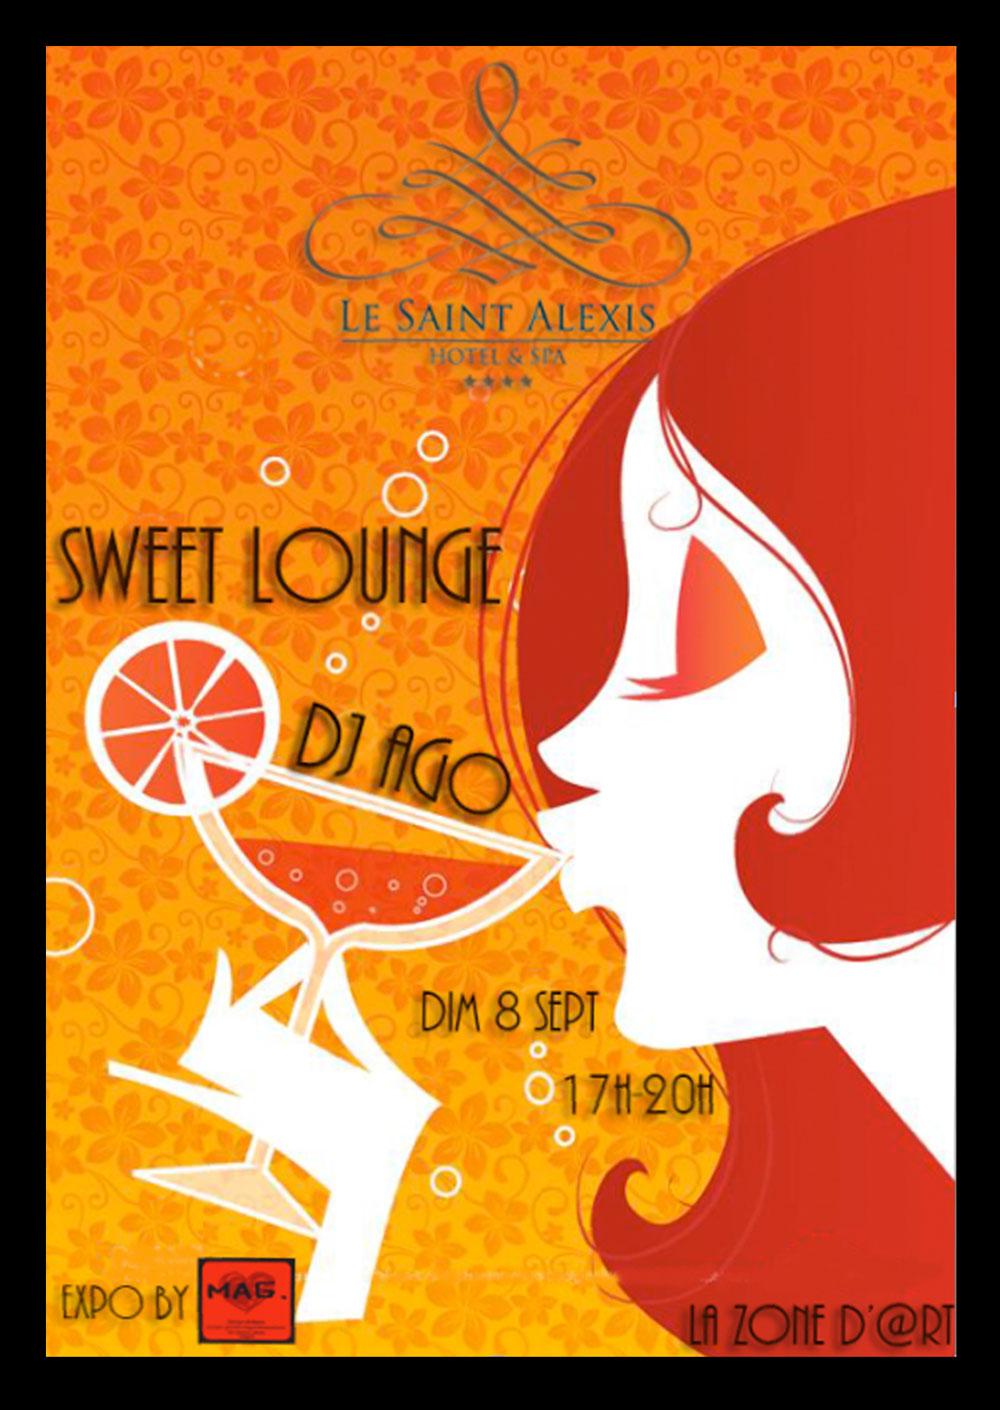 Sweet Lounge au Saint-Alexis